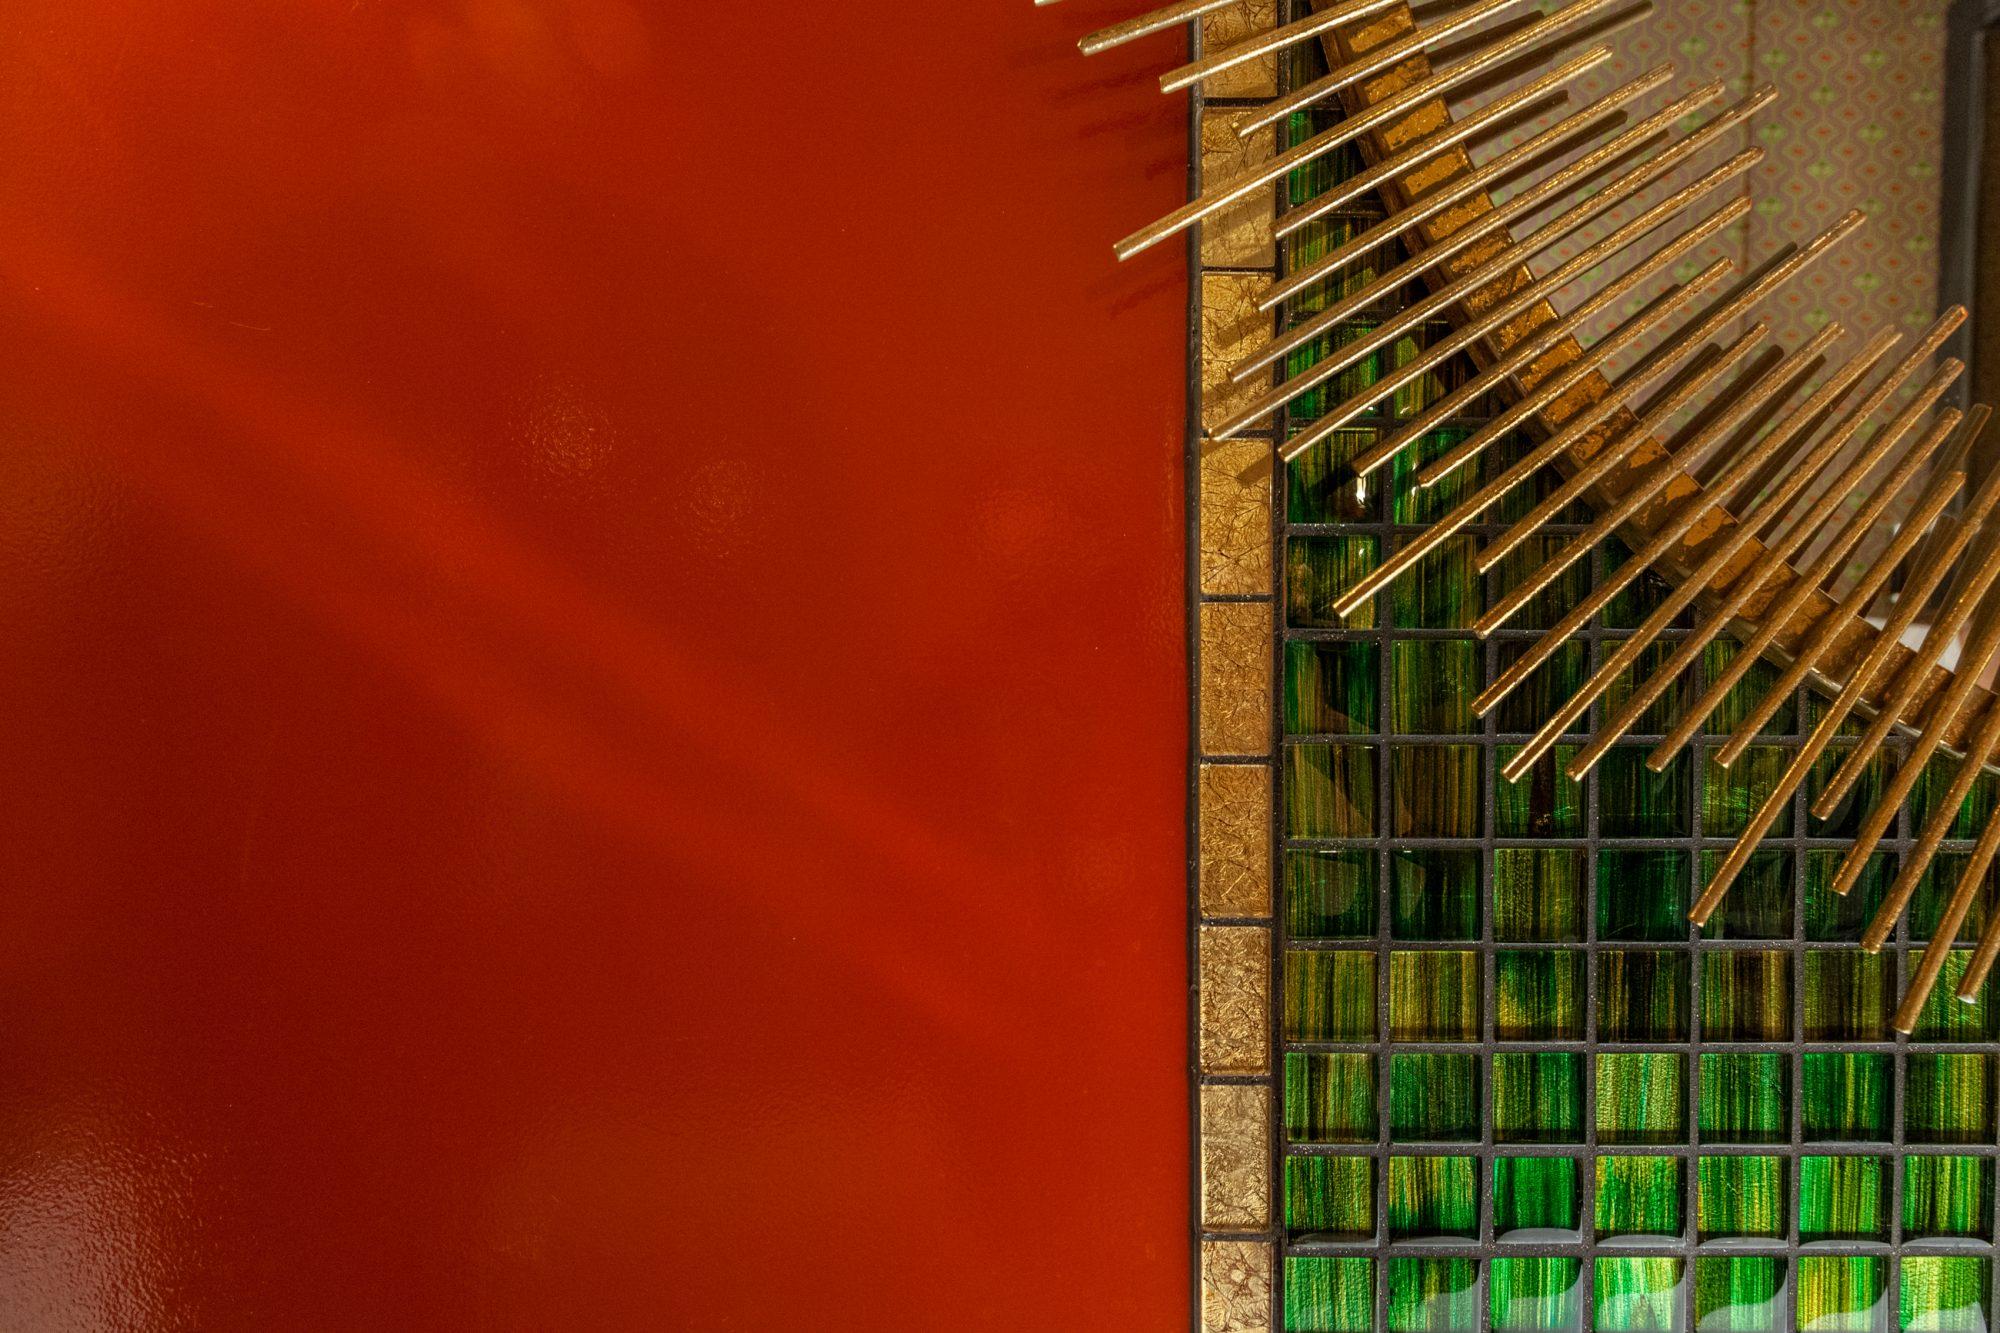 lindholz interior design detail farrow and ball charlottes locks emerald glass mosaic tiles